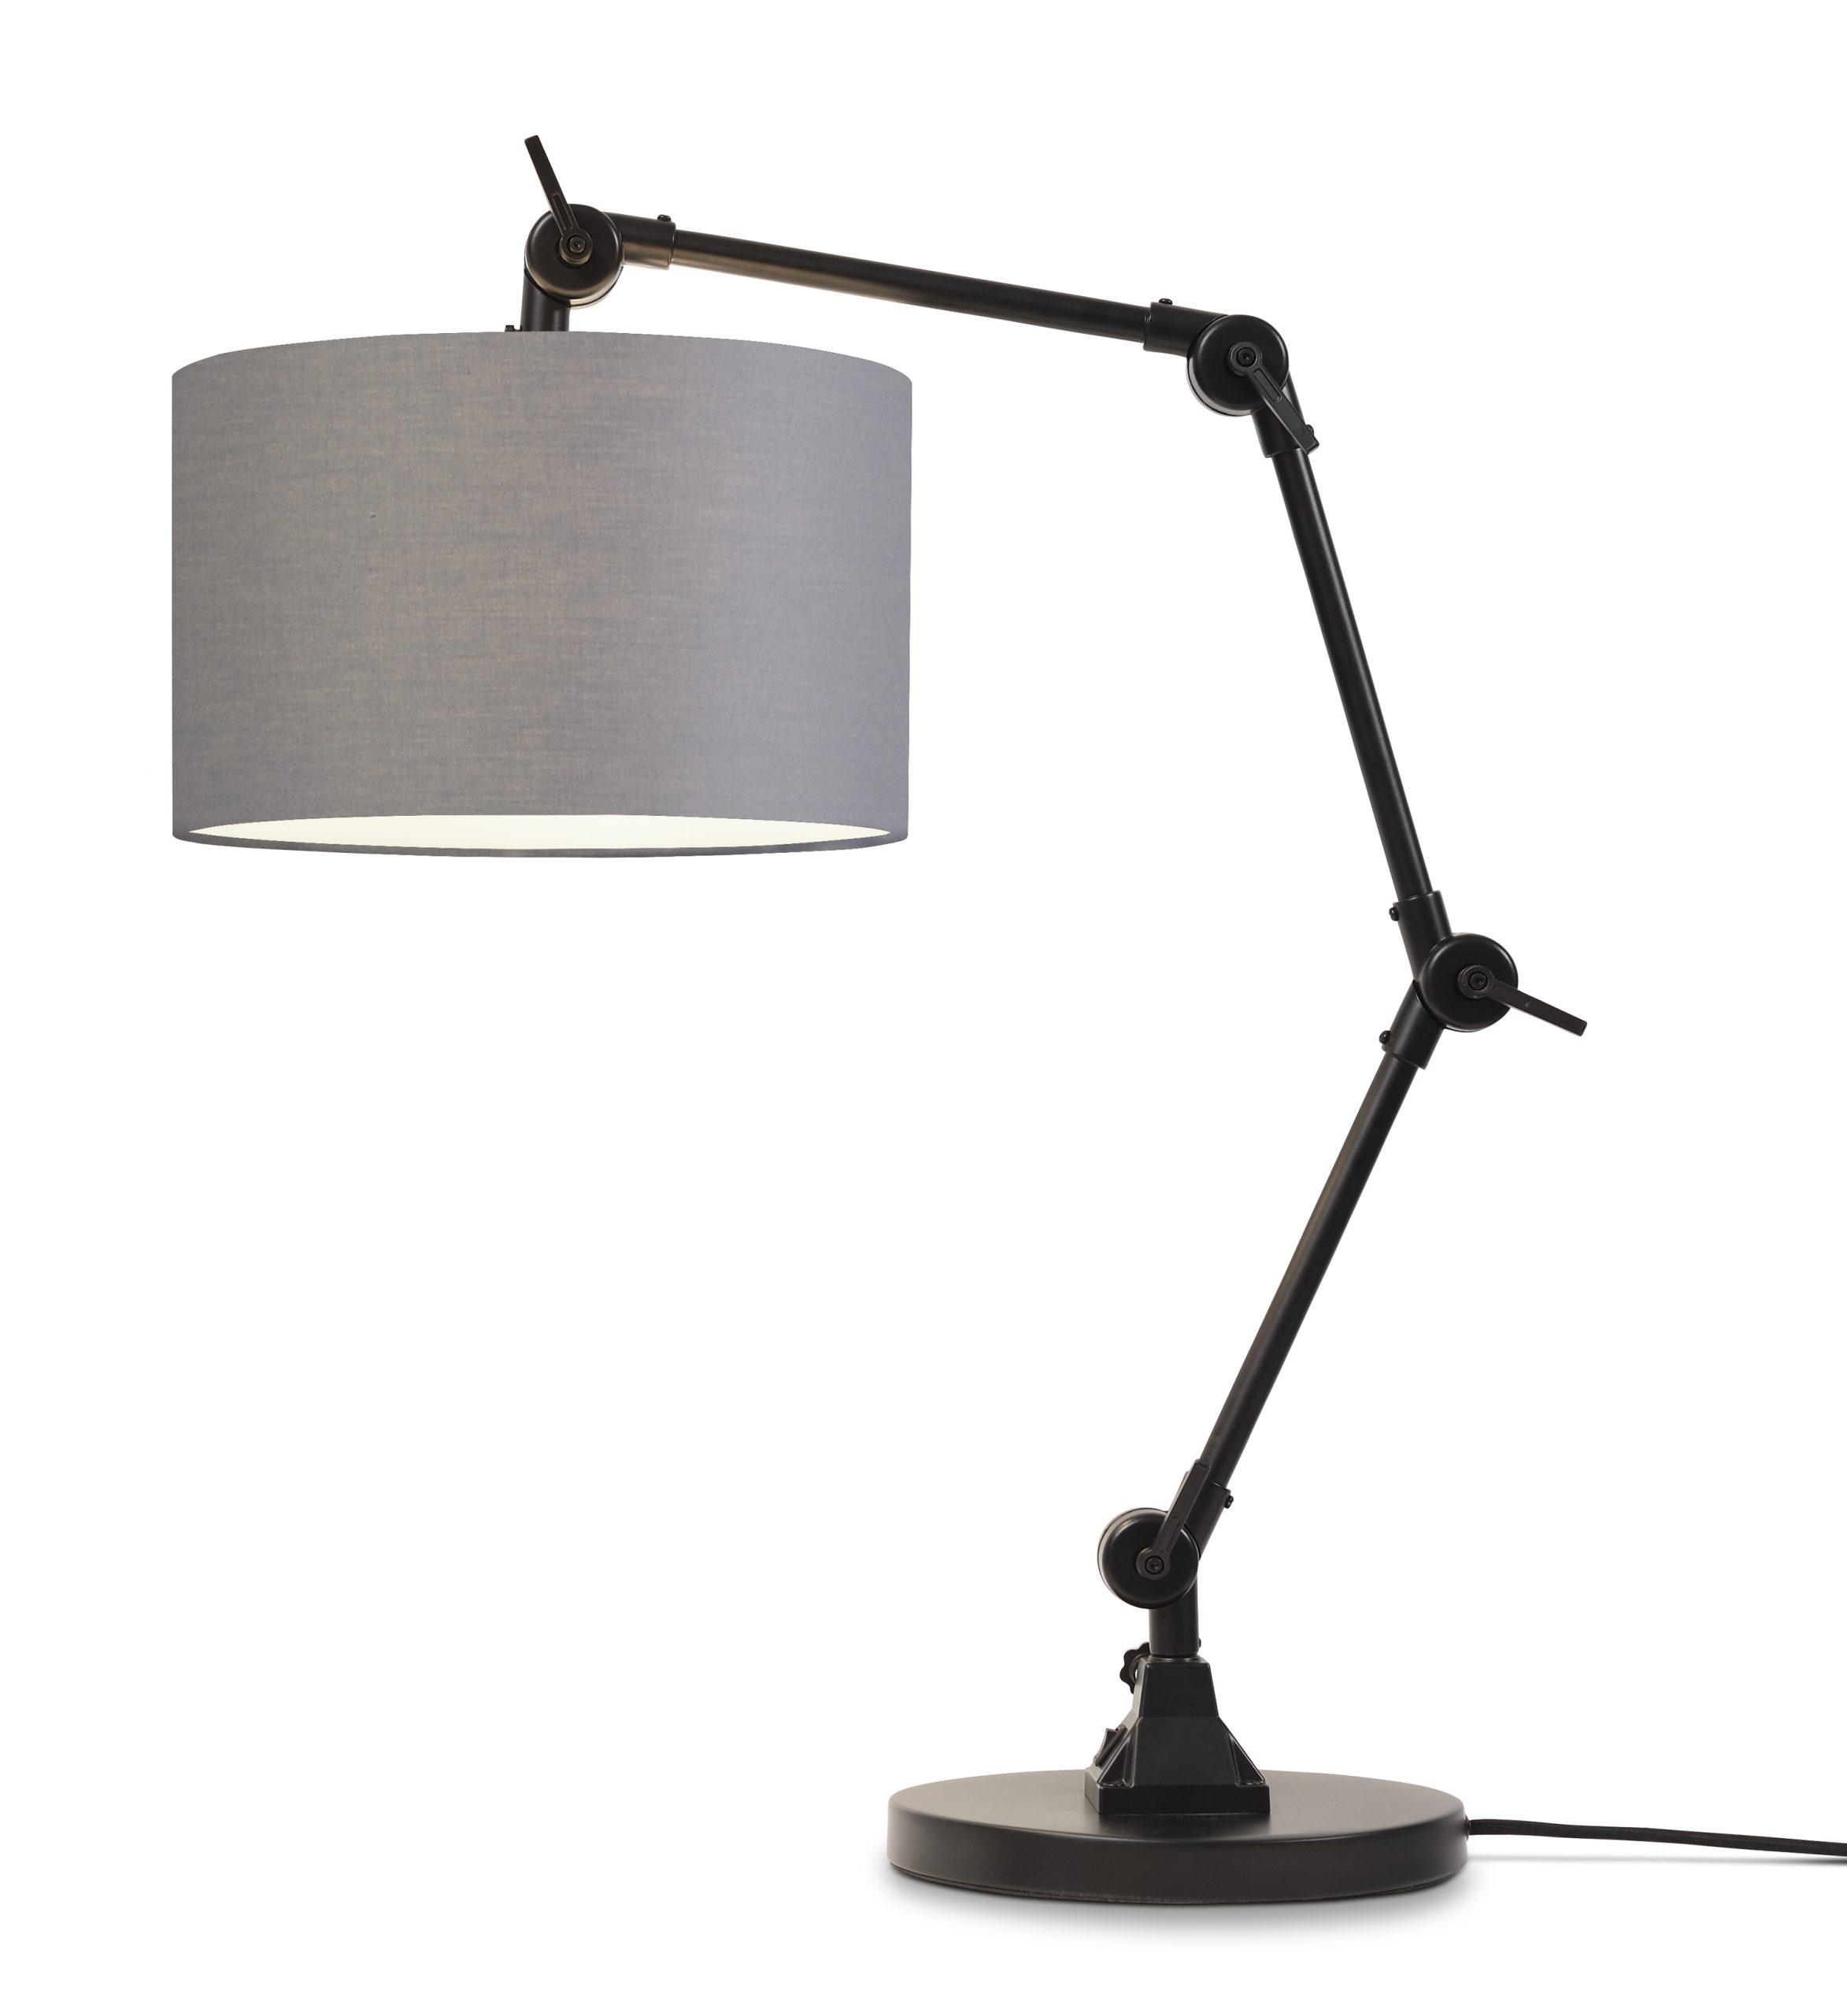 Tafellamp Amsterdam - Black/Light Grey